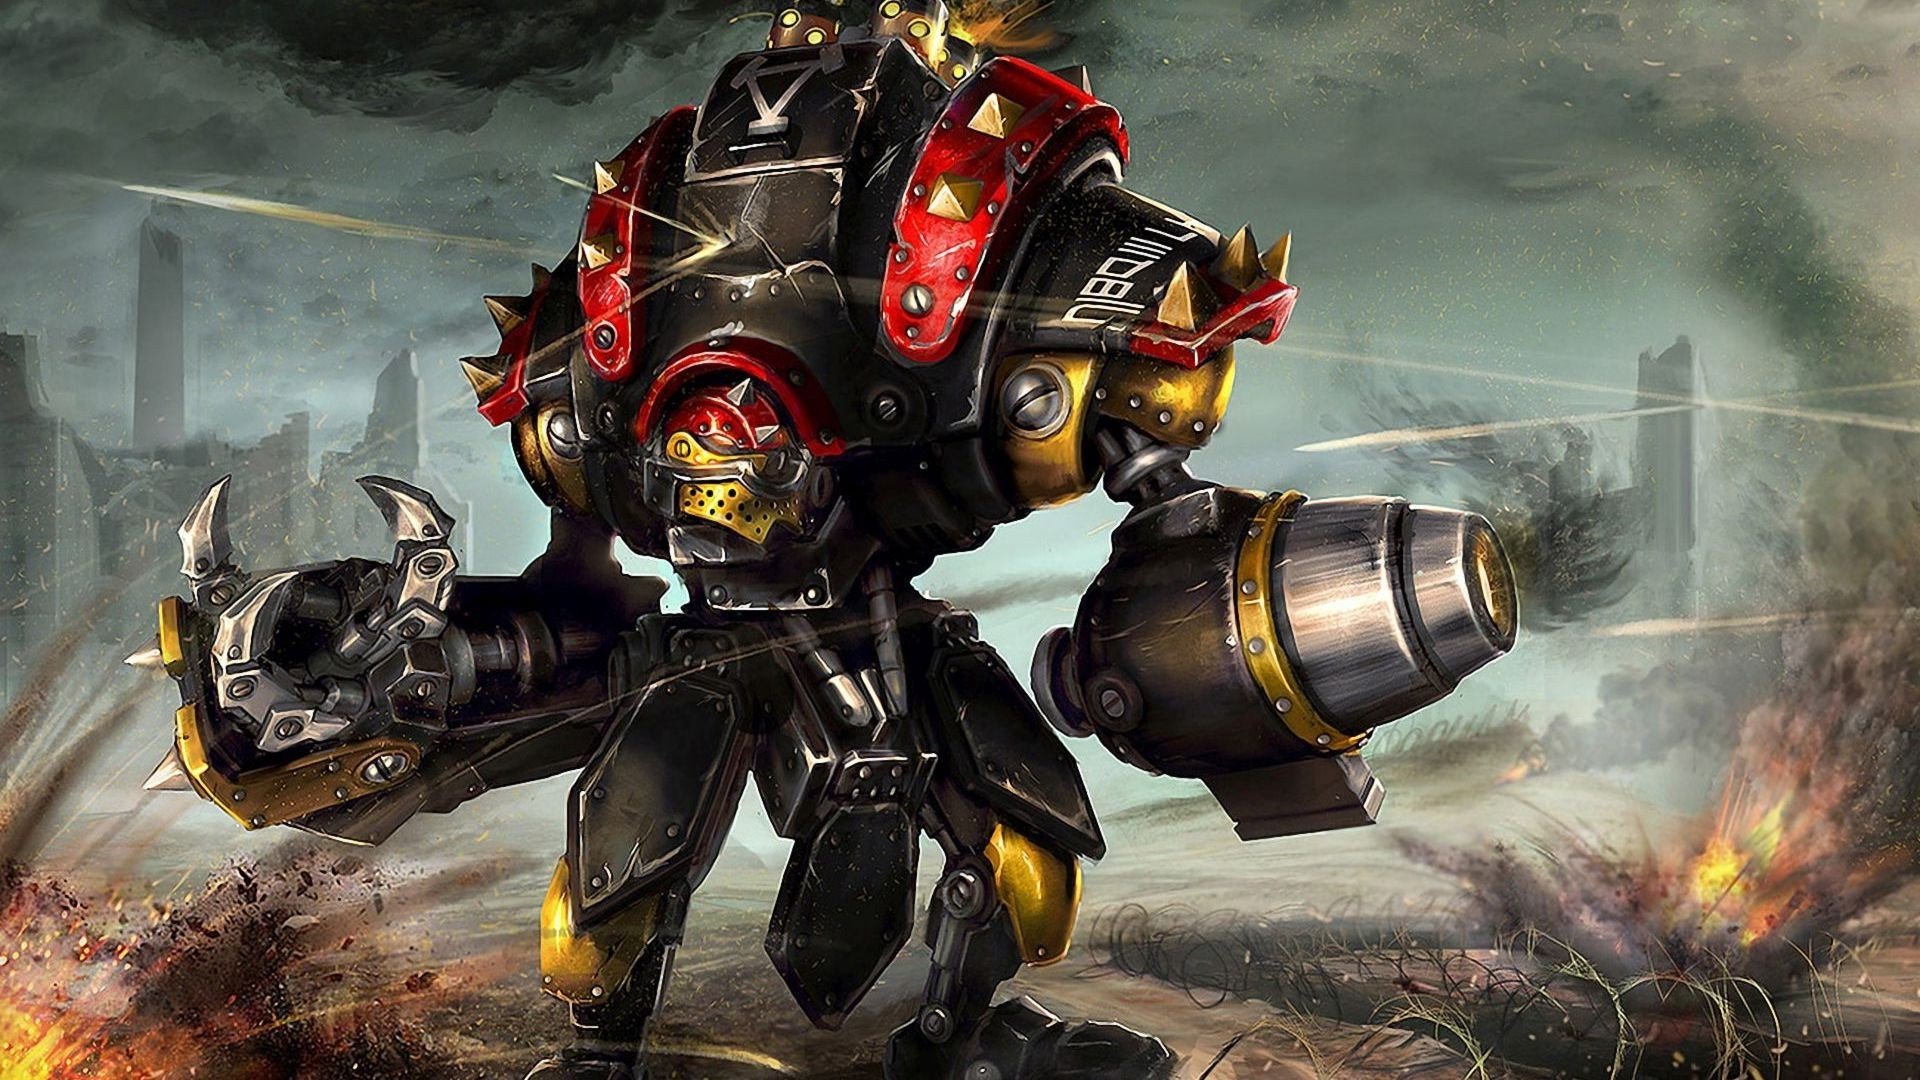 robot, Mech, Artwork, Fantasy Art, War, Destruction, Concept Art, Warmachine  Wallpapers HD / Desktop and Mobile Backgrounds